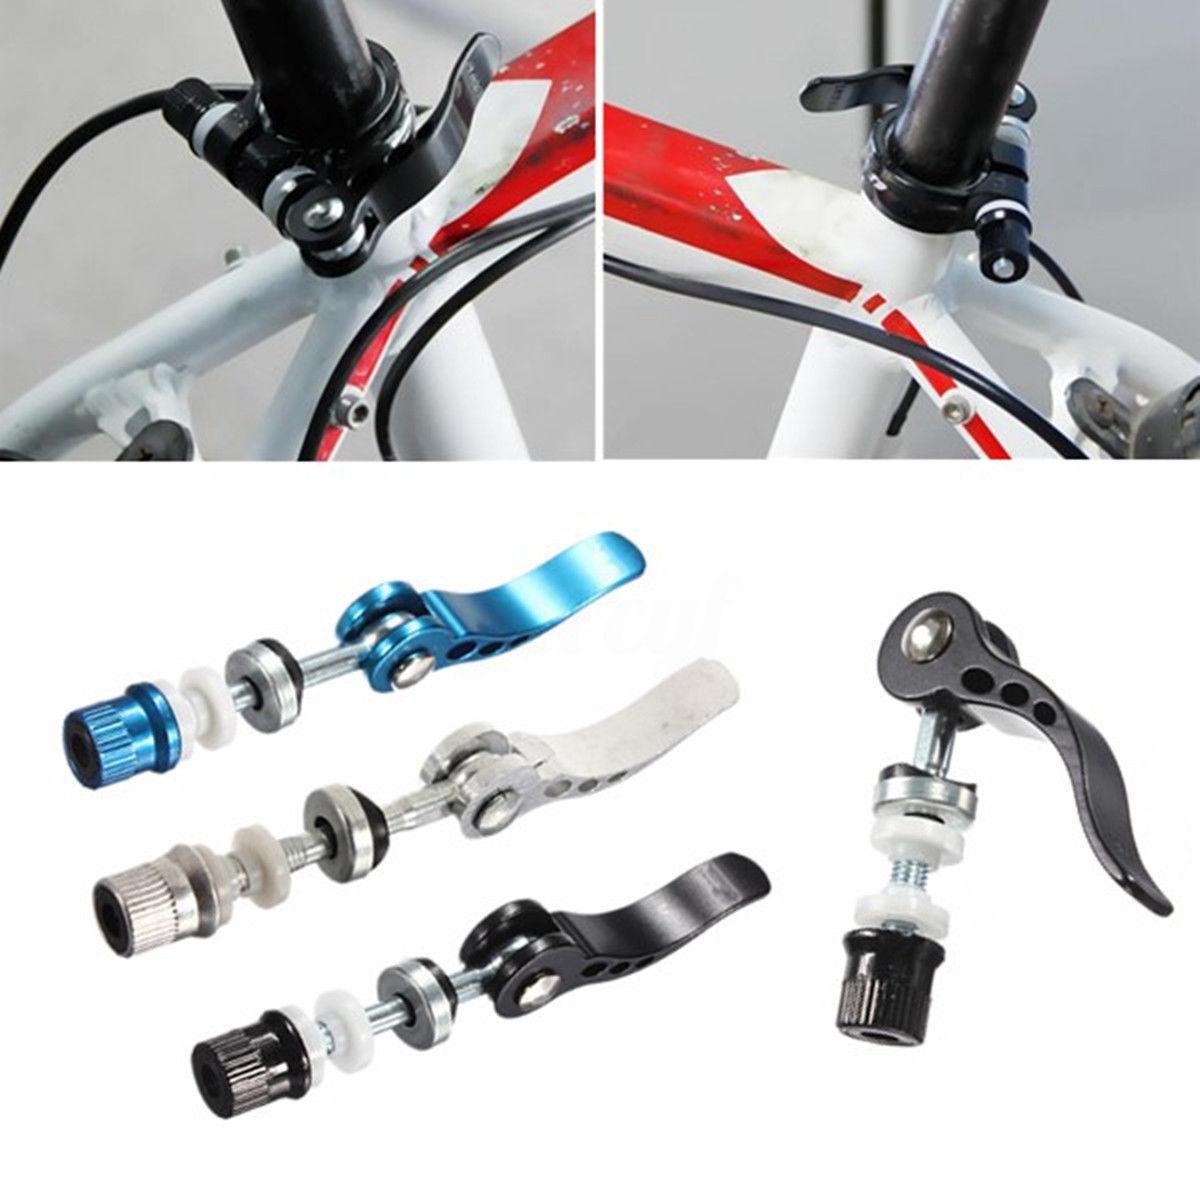 Release Bike Seat Clamp Accessories Mountain Bike Skewer Bolt Seat Tube Clamp